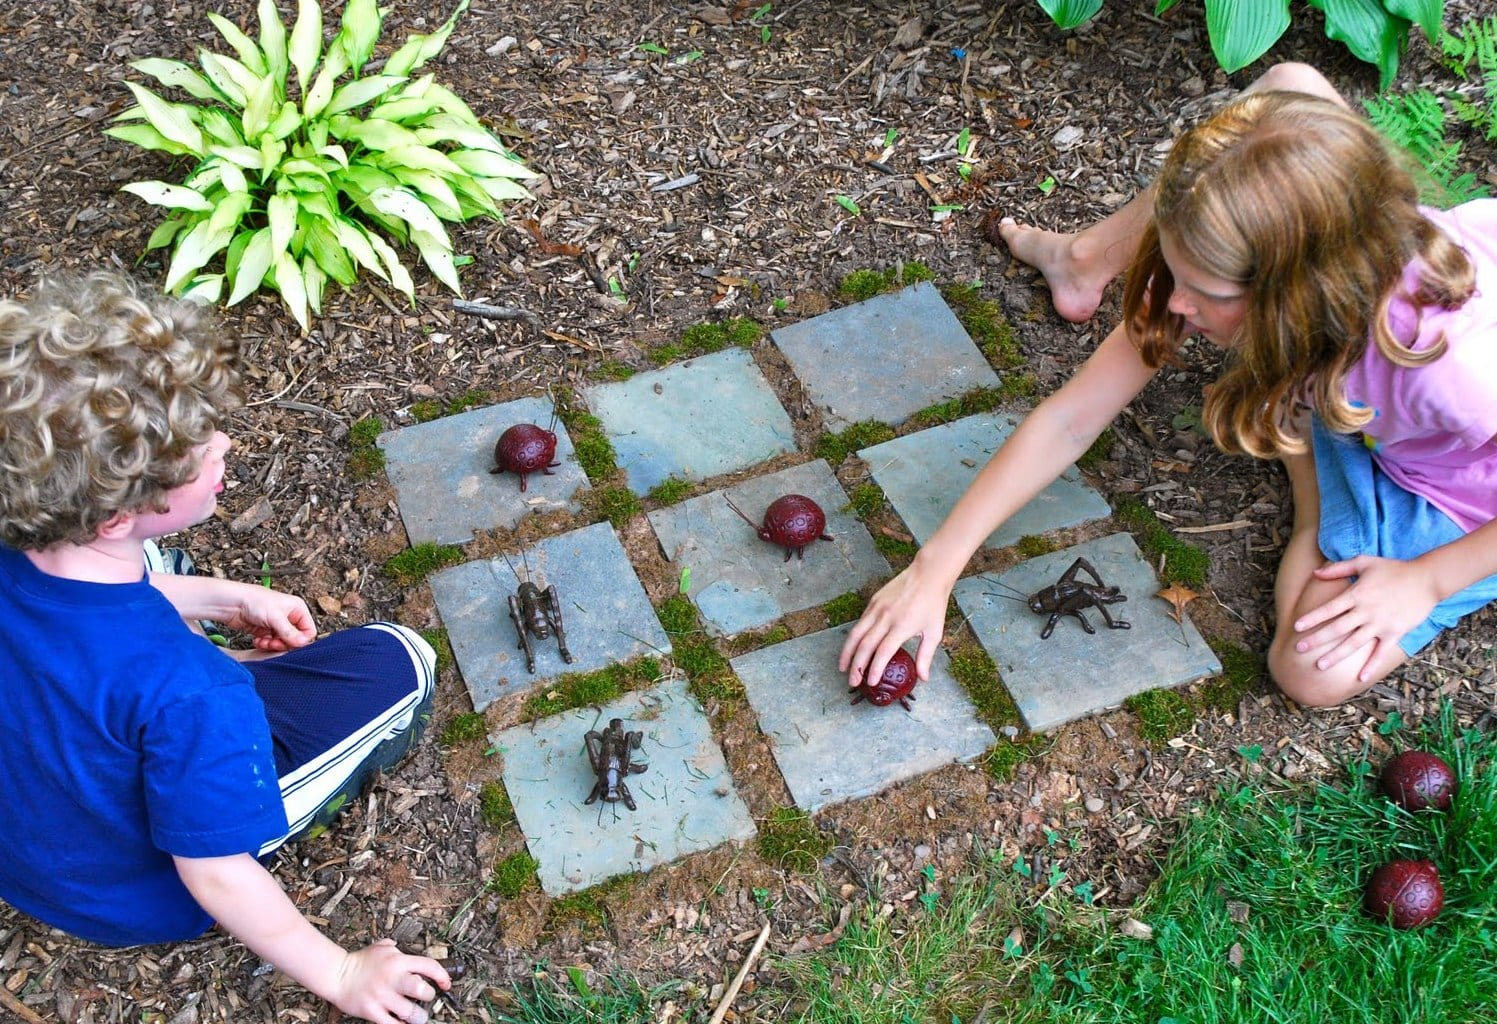 idee fr kinderspiele auen diy kinderspielplatz aus naturmaterialien - Idee Fur Gartengestaltung